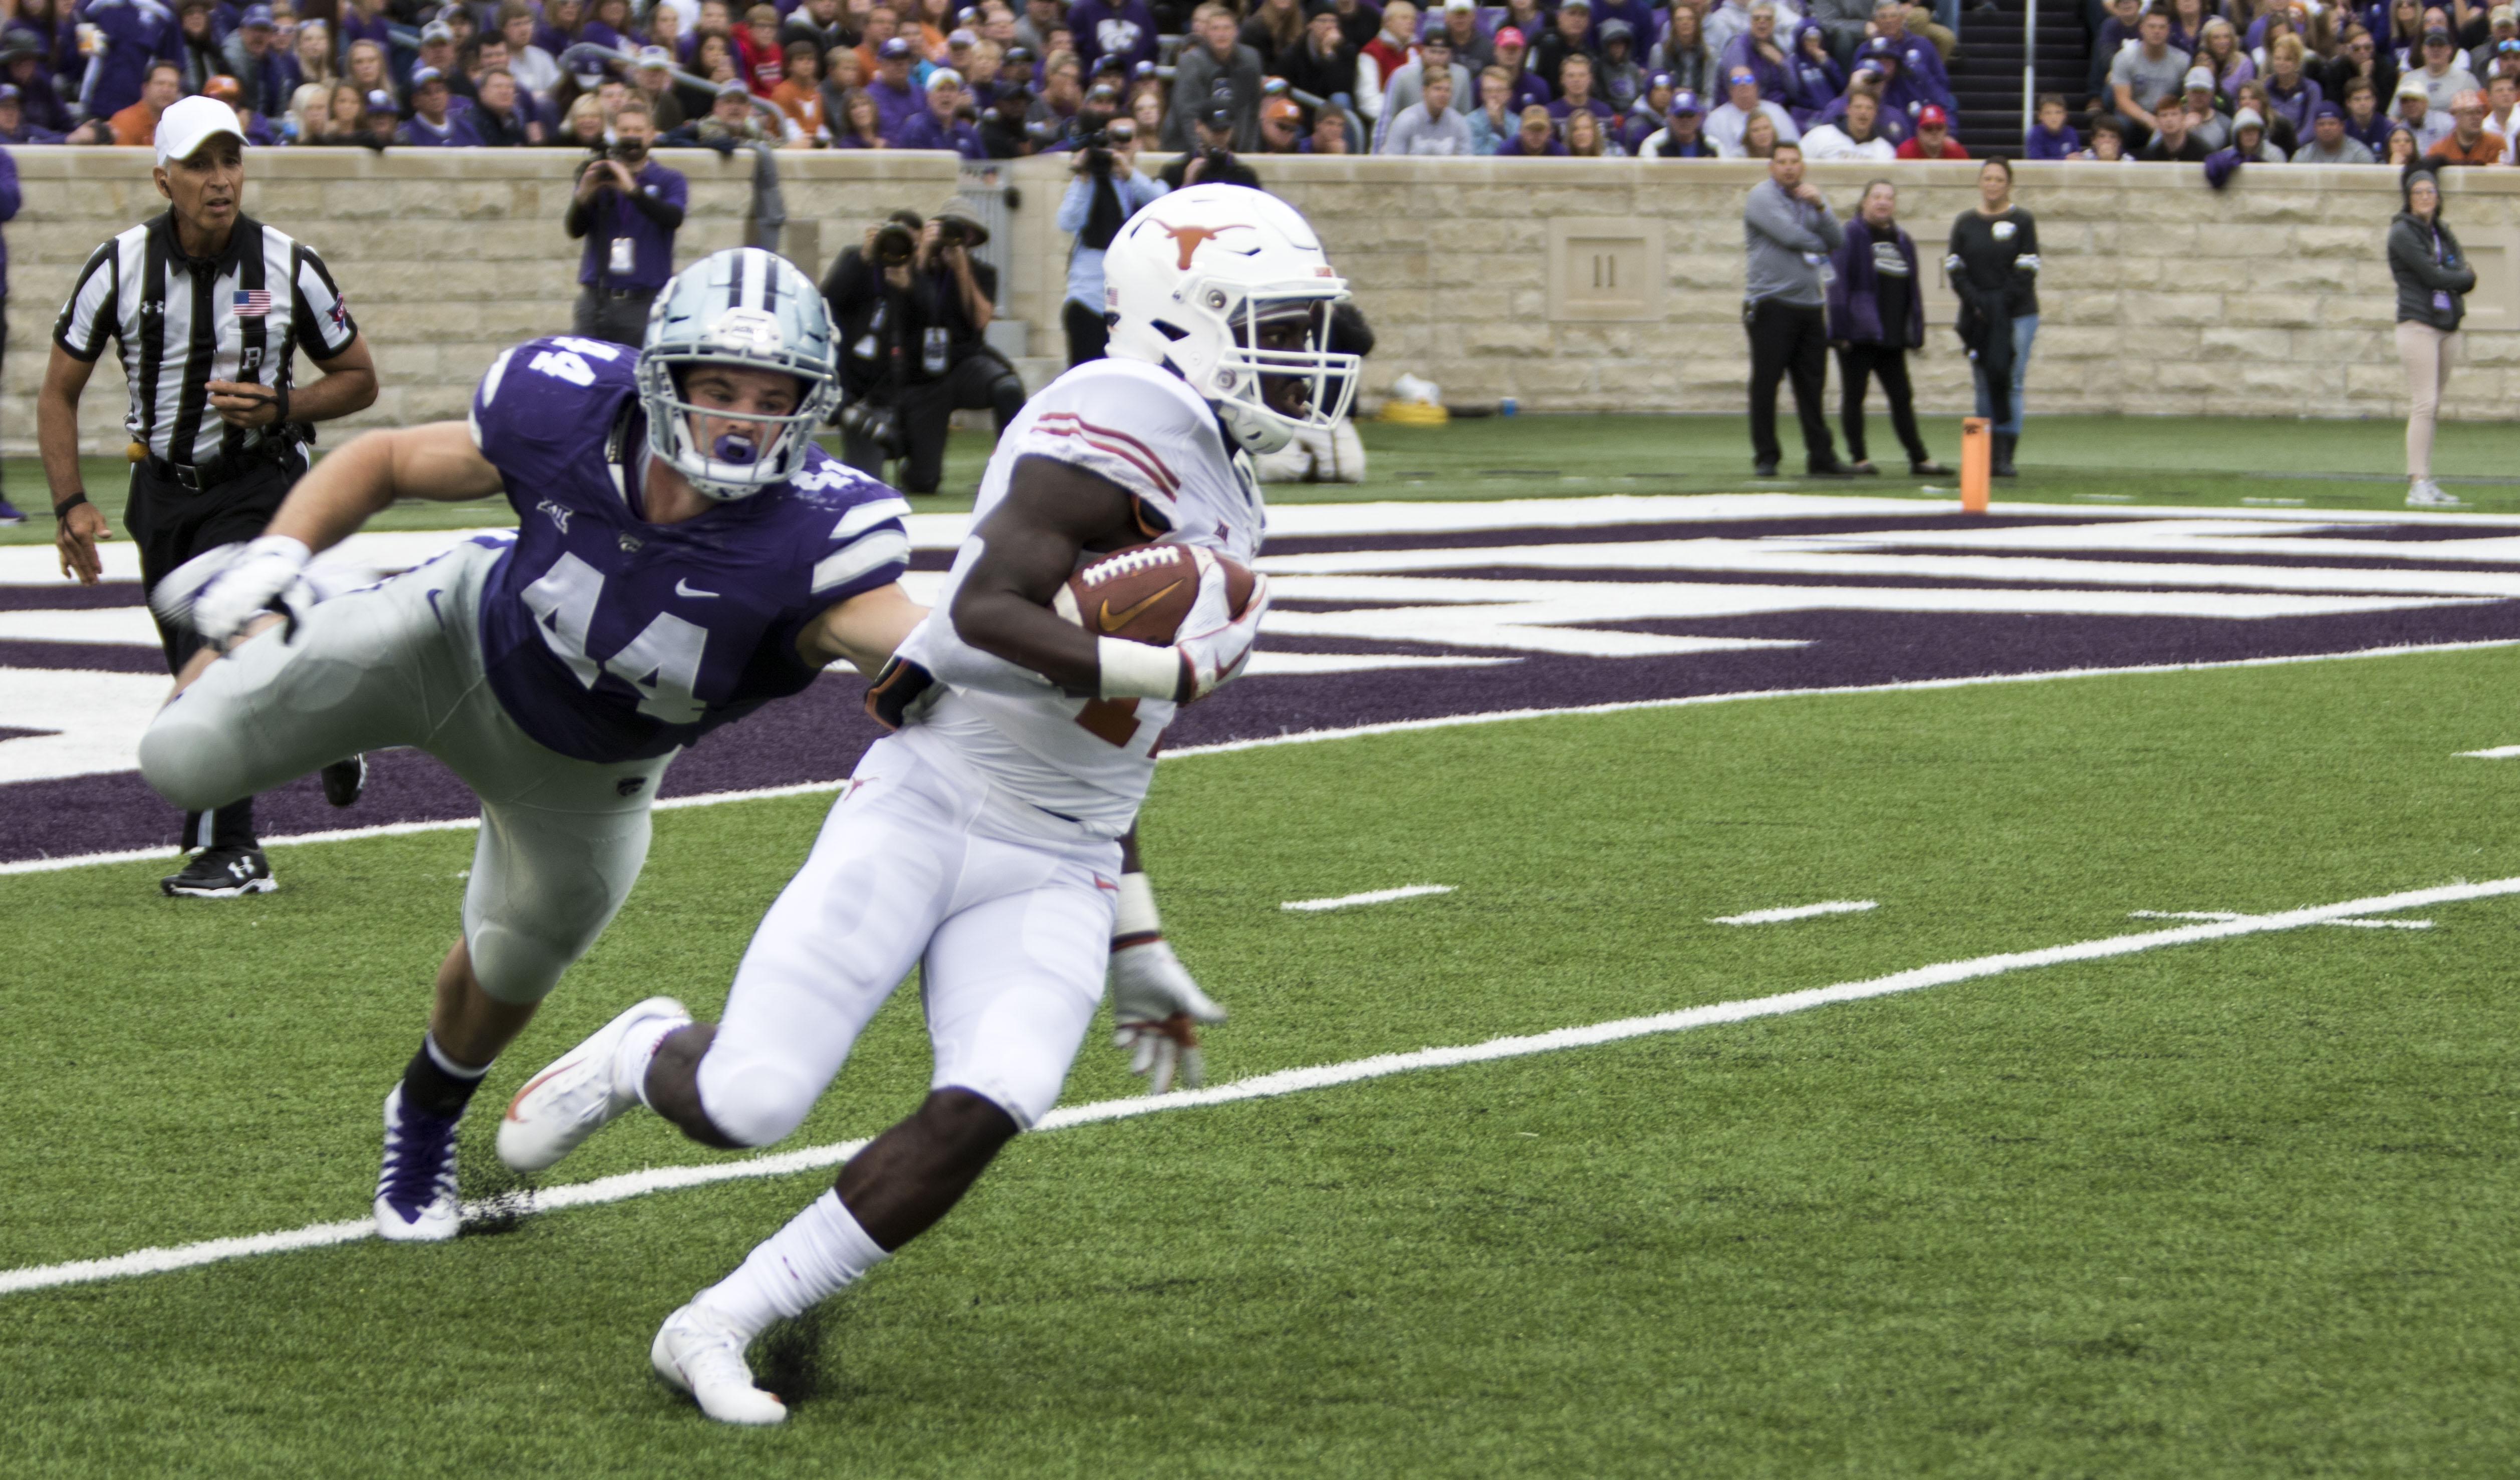 Longhorns survive Kansas State in 19-14 thriller